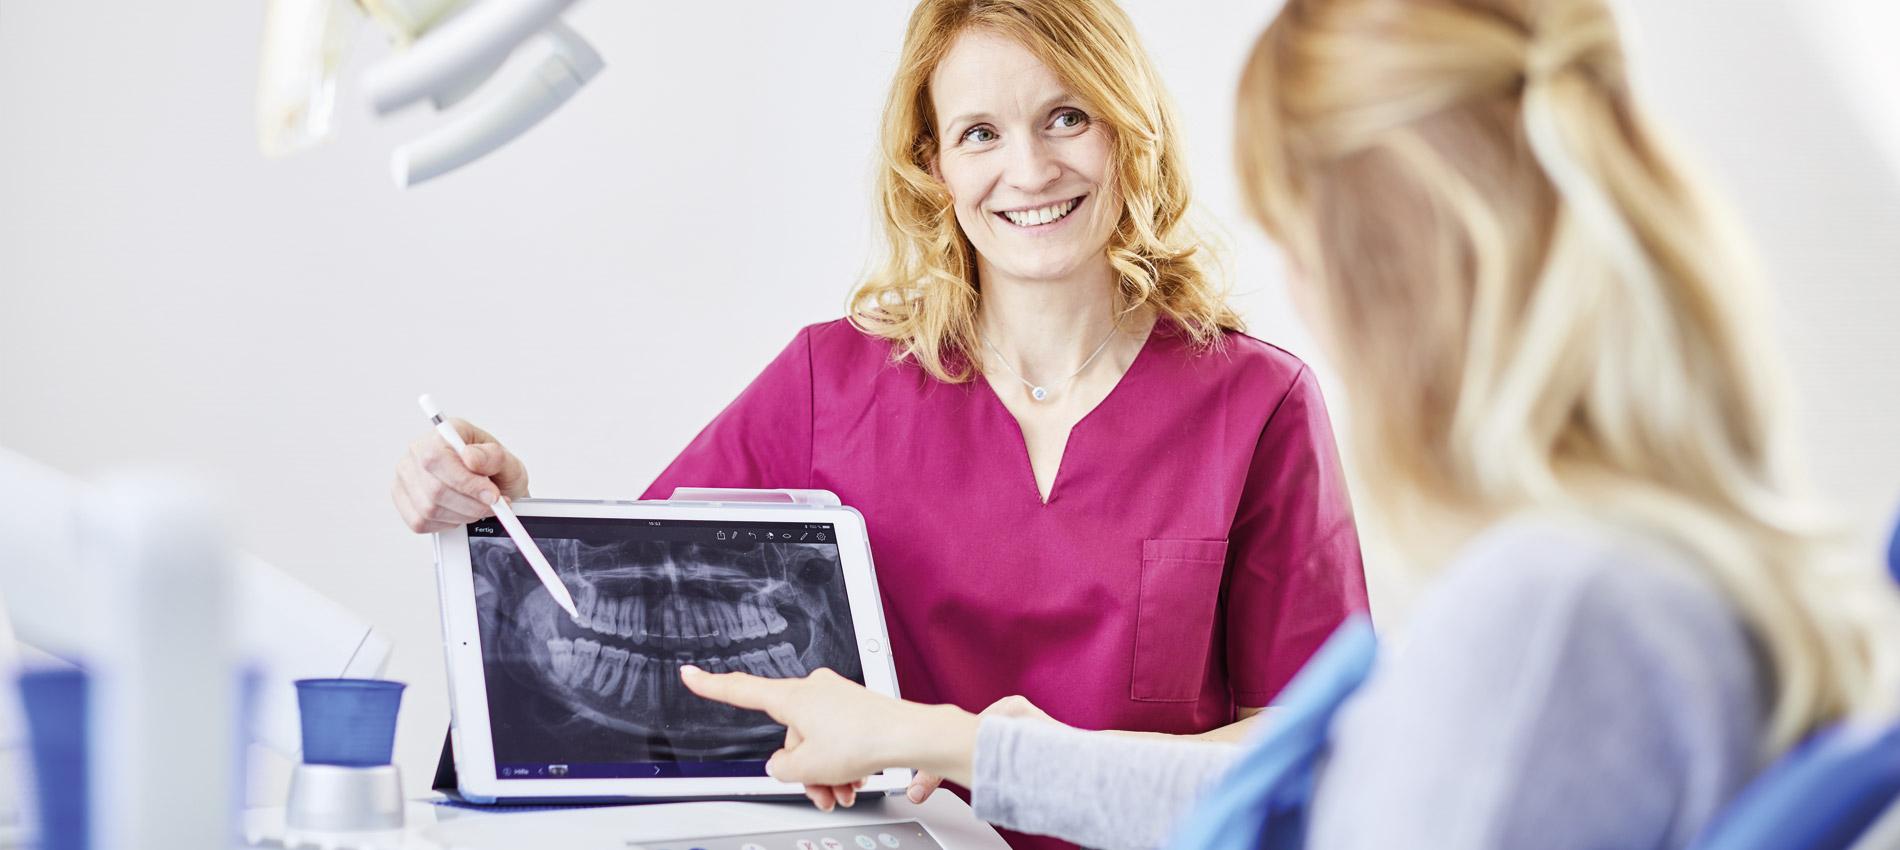 Zahnarztpraxis Dr. Christiane Langrock - Weisheitszahnentfernung 1